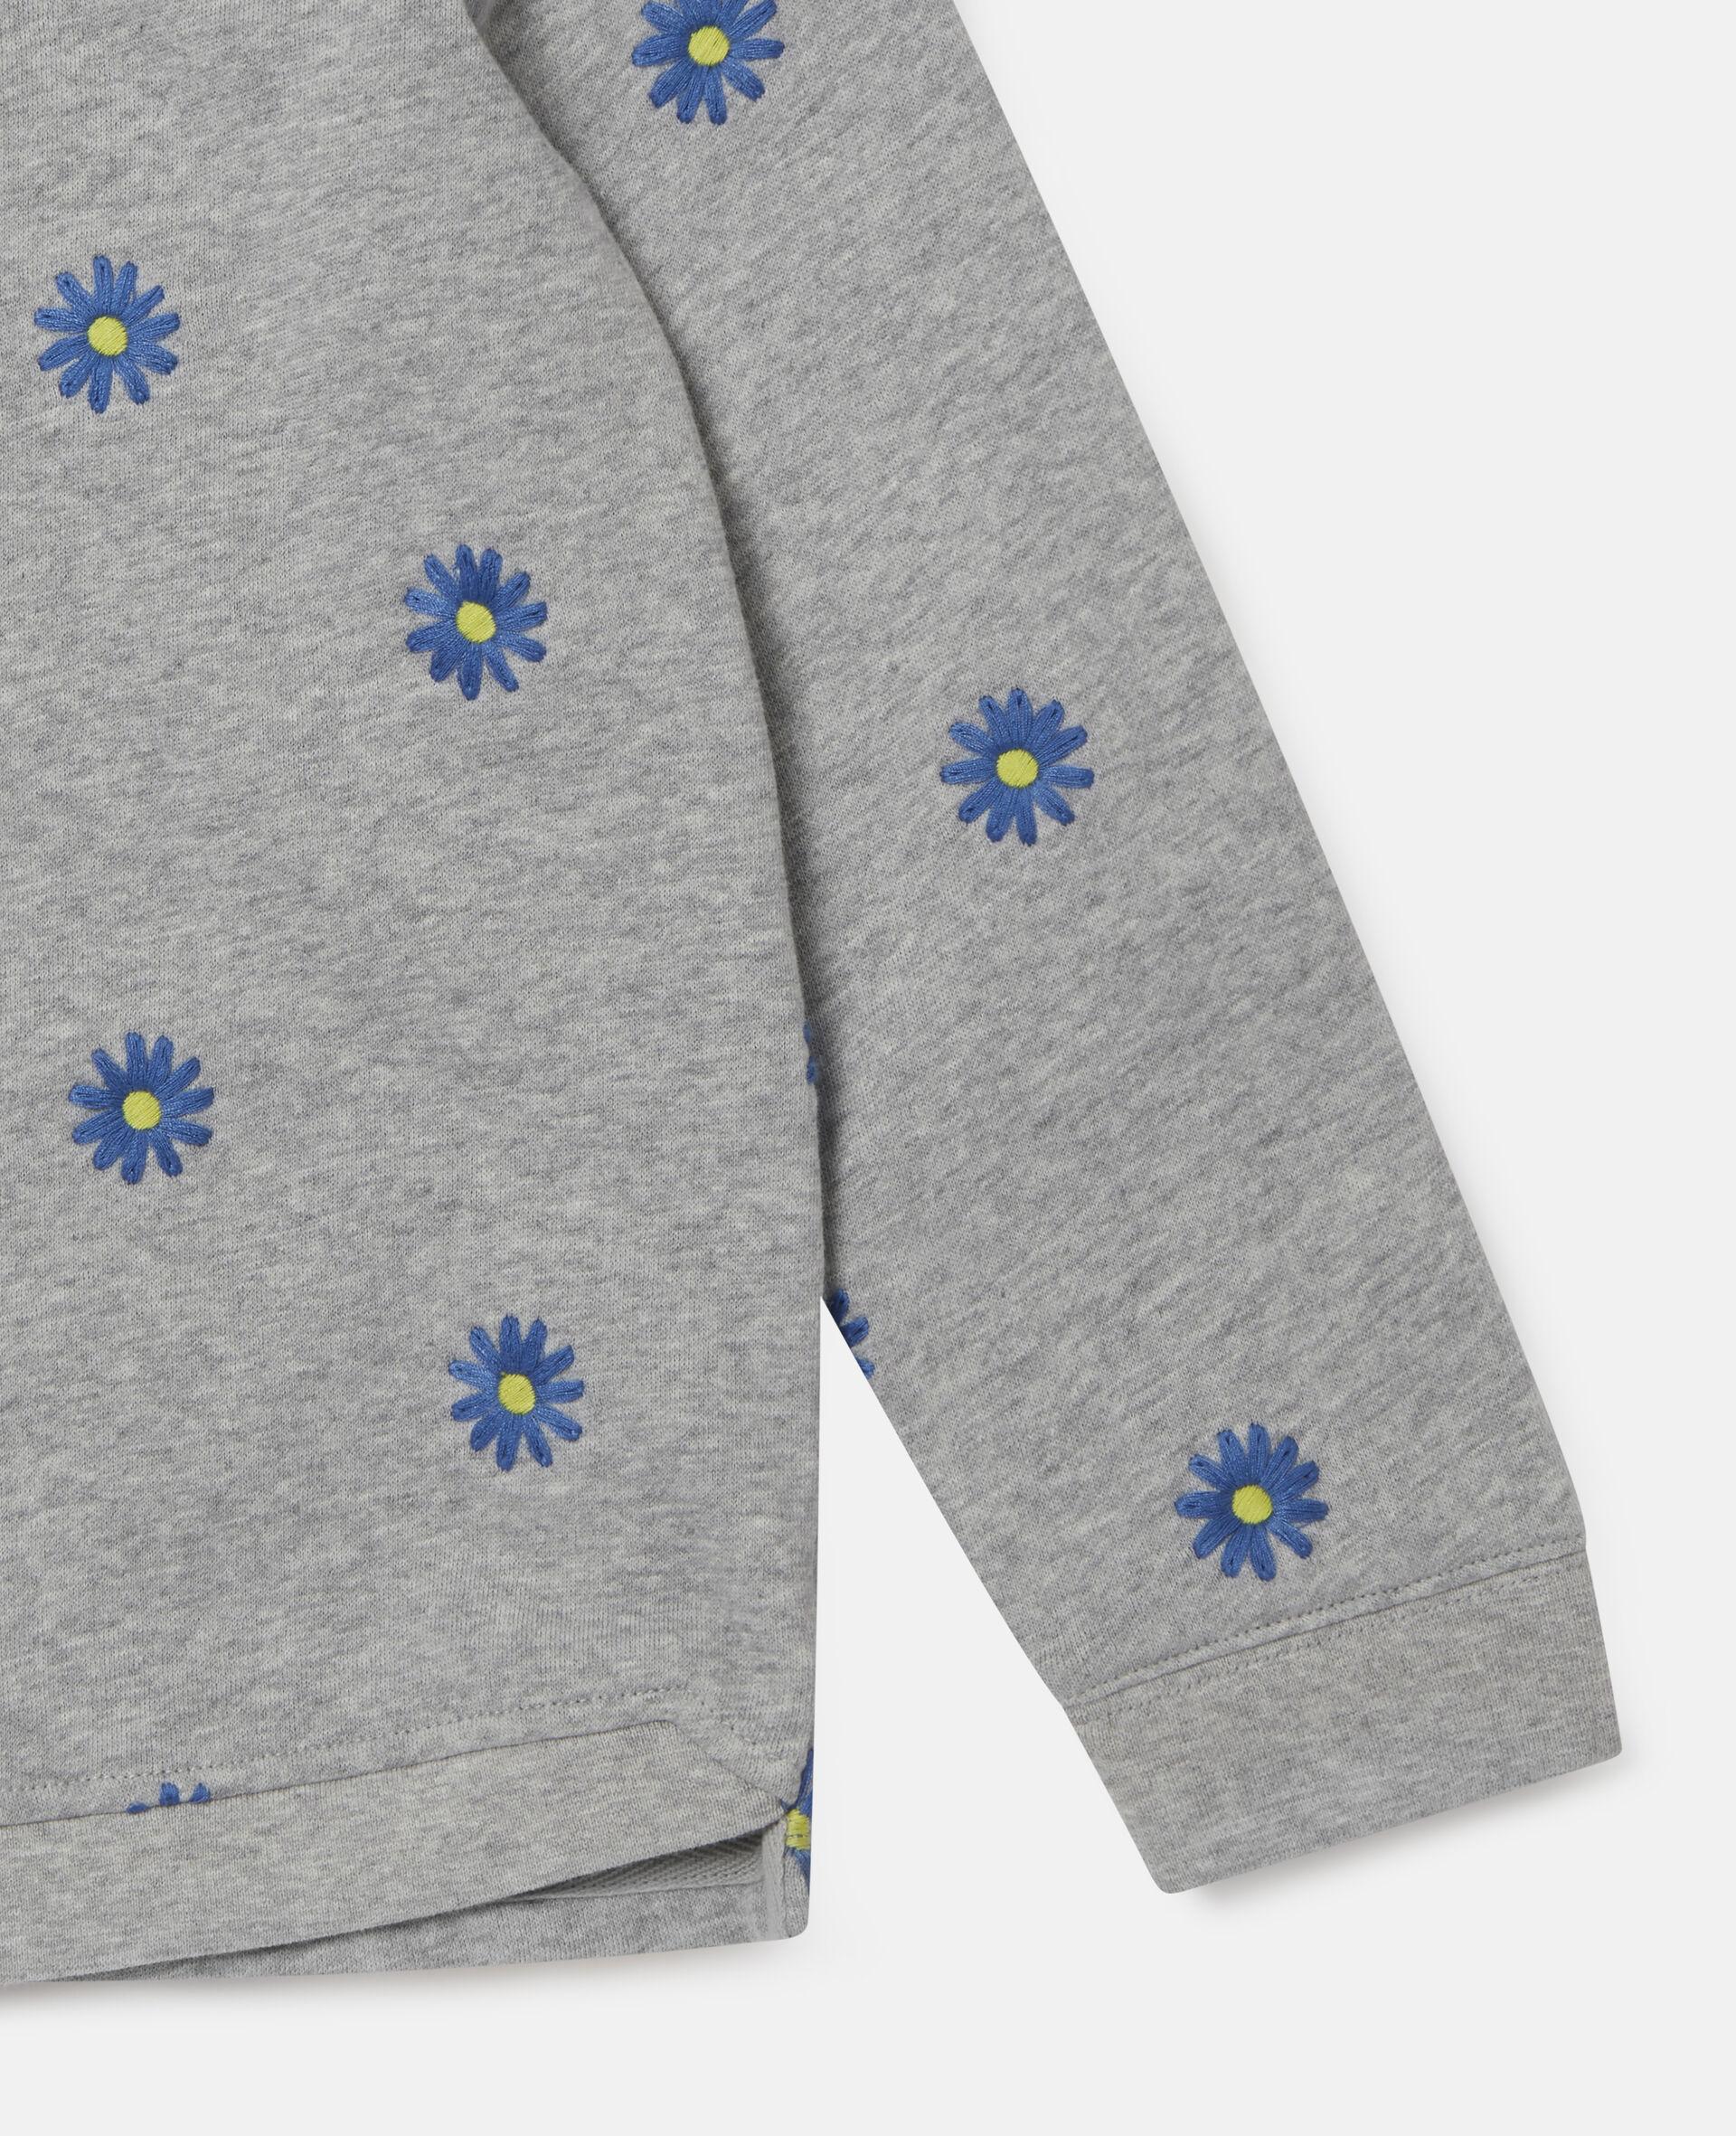 Baumwollfleece-Sweatshirt mit Gänseblümchenmotiv -Grau-large image number 2